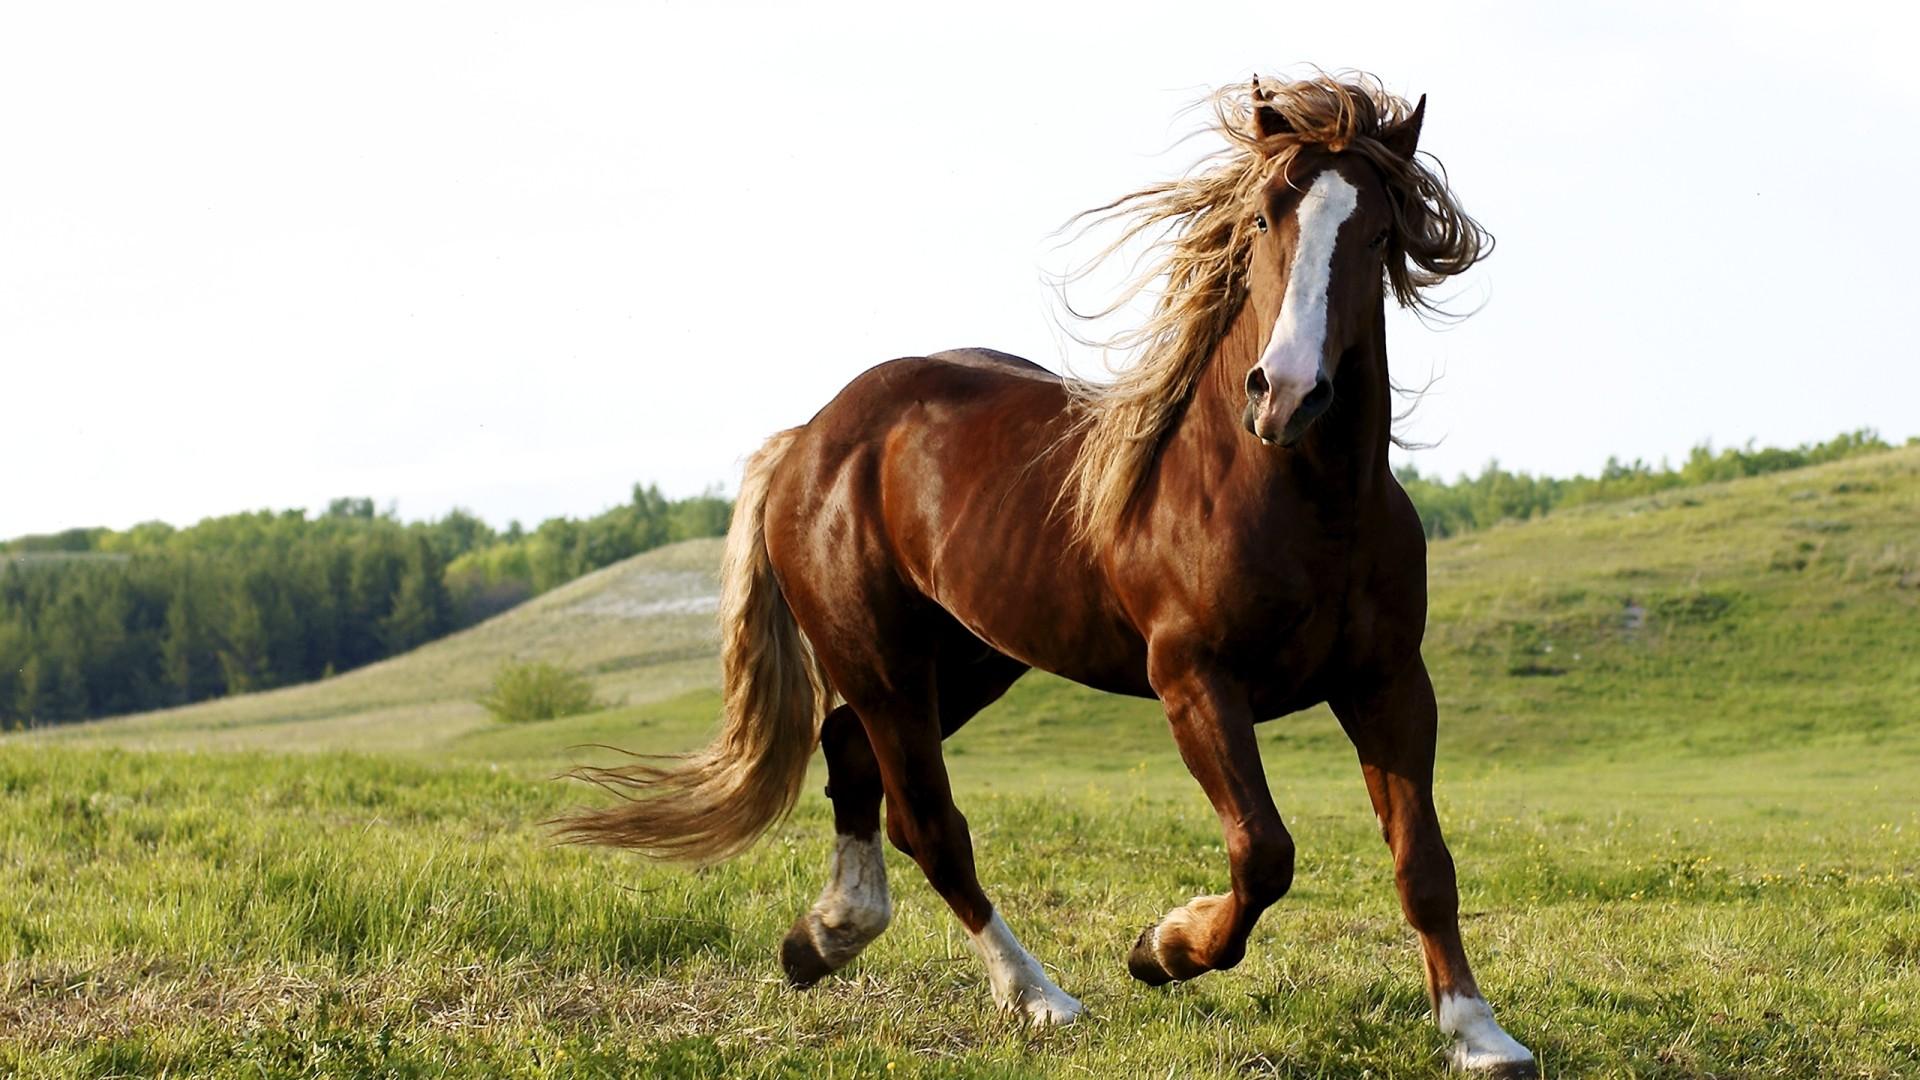 Wild Horse Full Hd Wallpaper Horse Riding Background Hd 1920x1080 Download Hd Wallpaper Wallpapertip